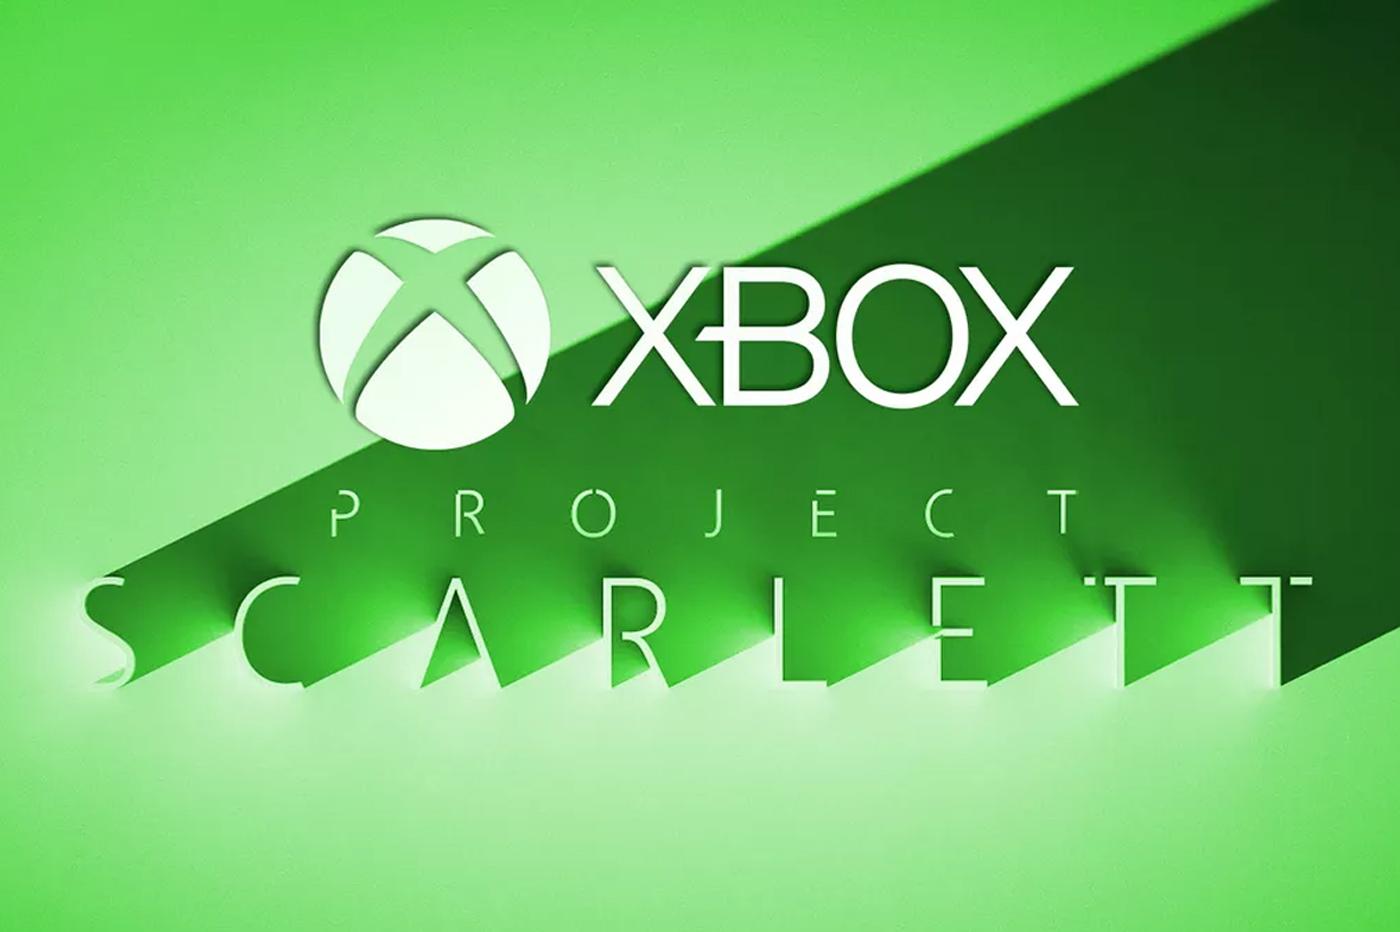 Project Scarlett Microsoft